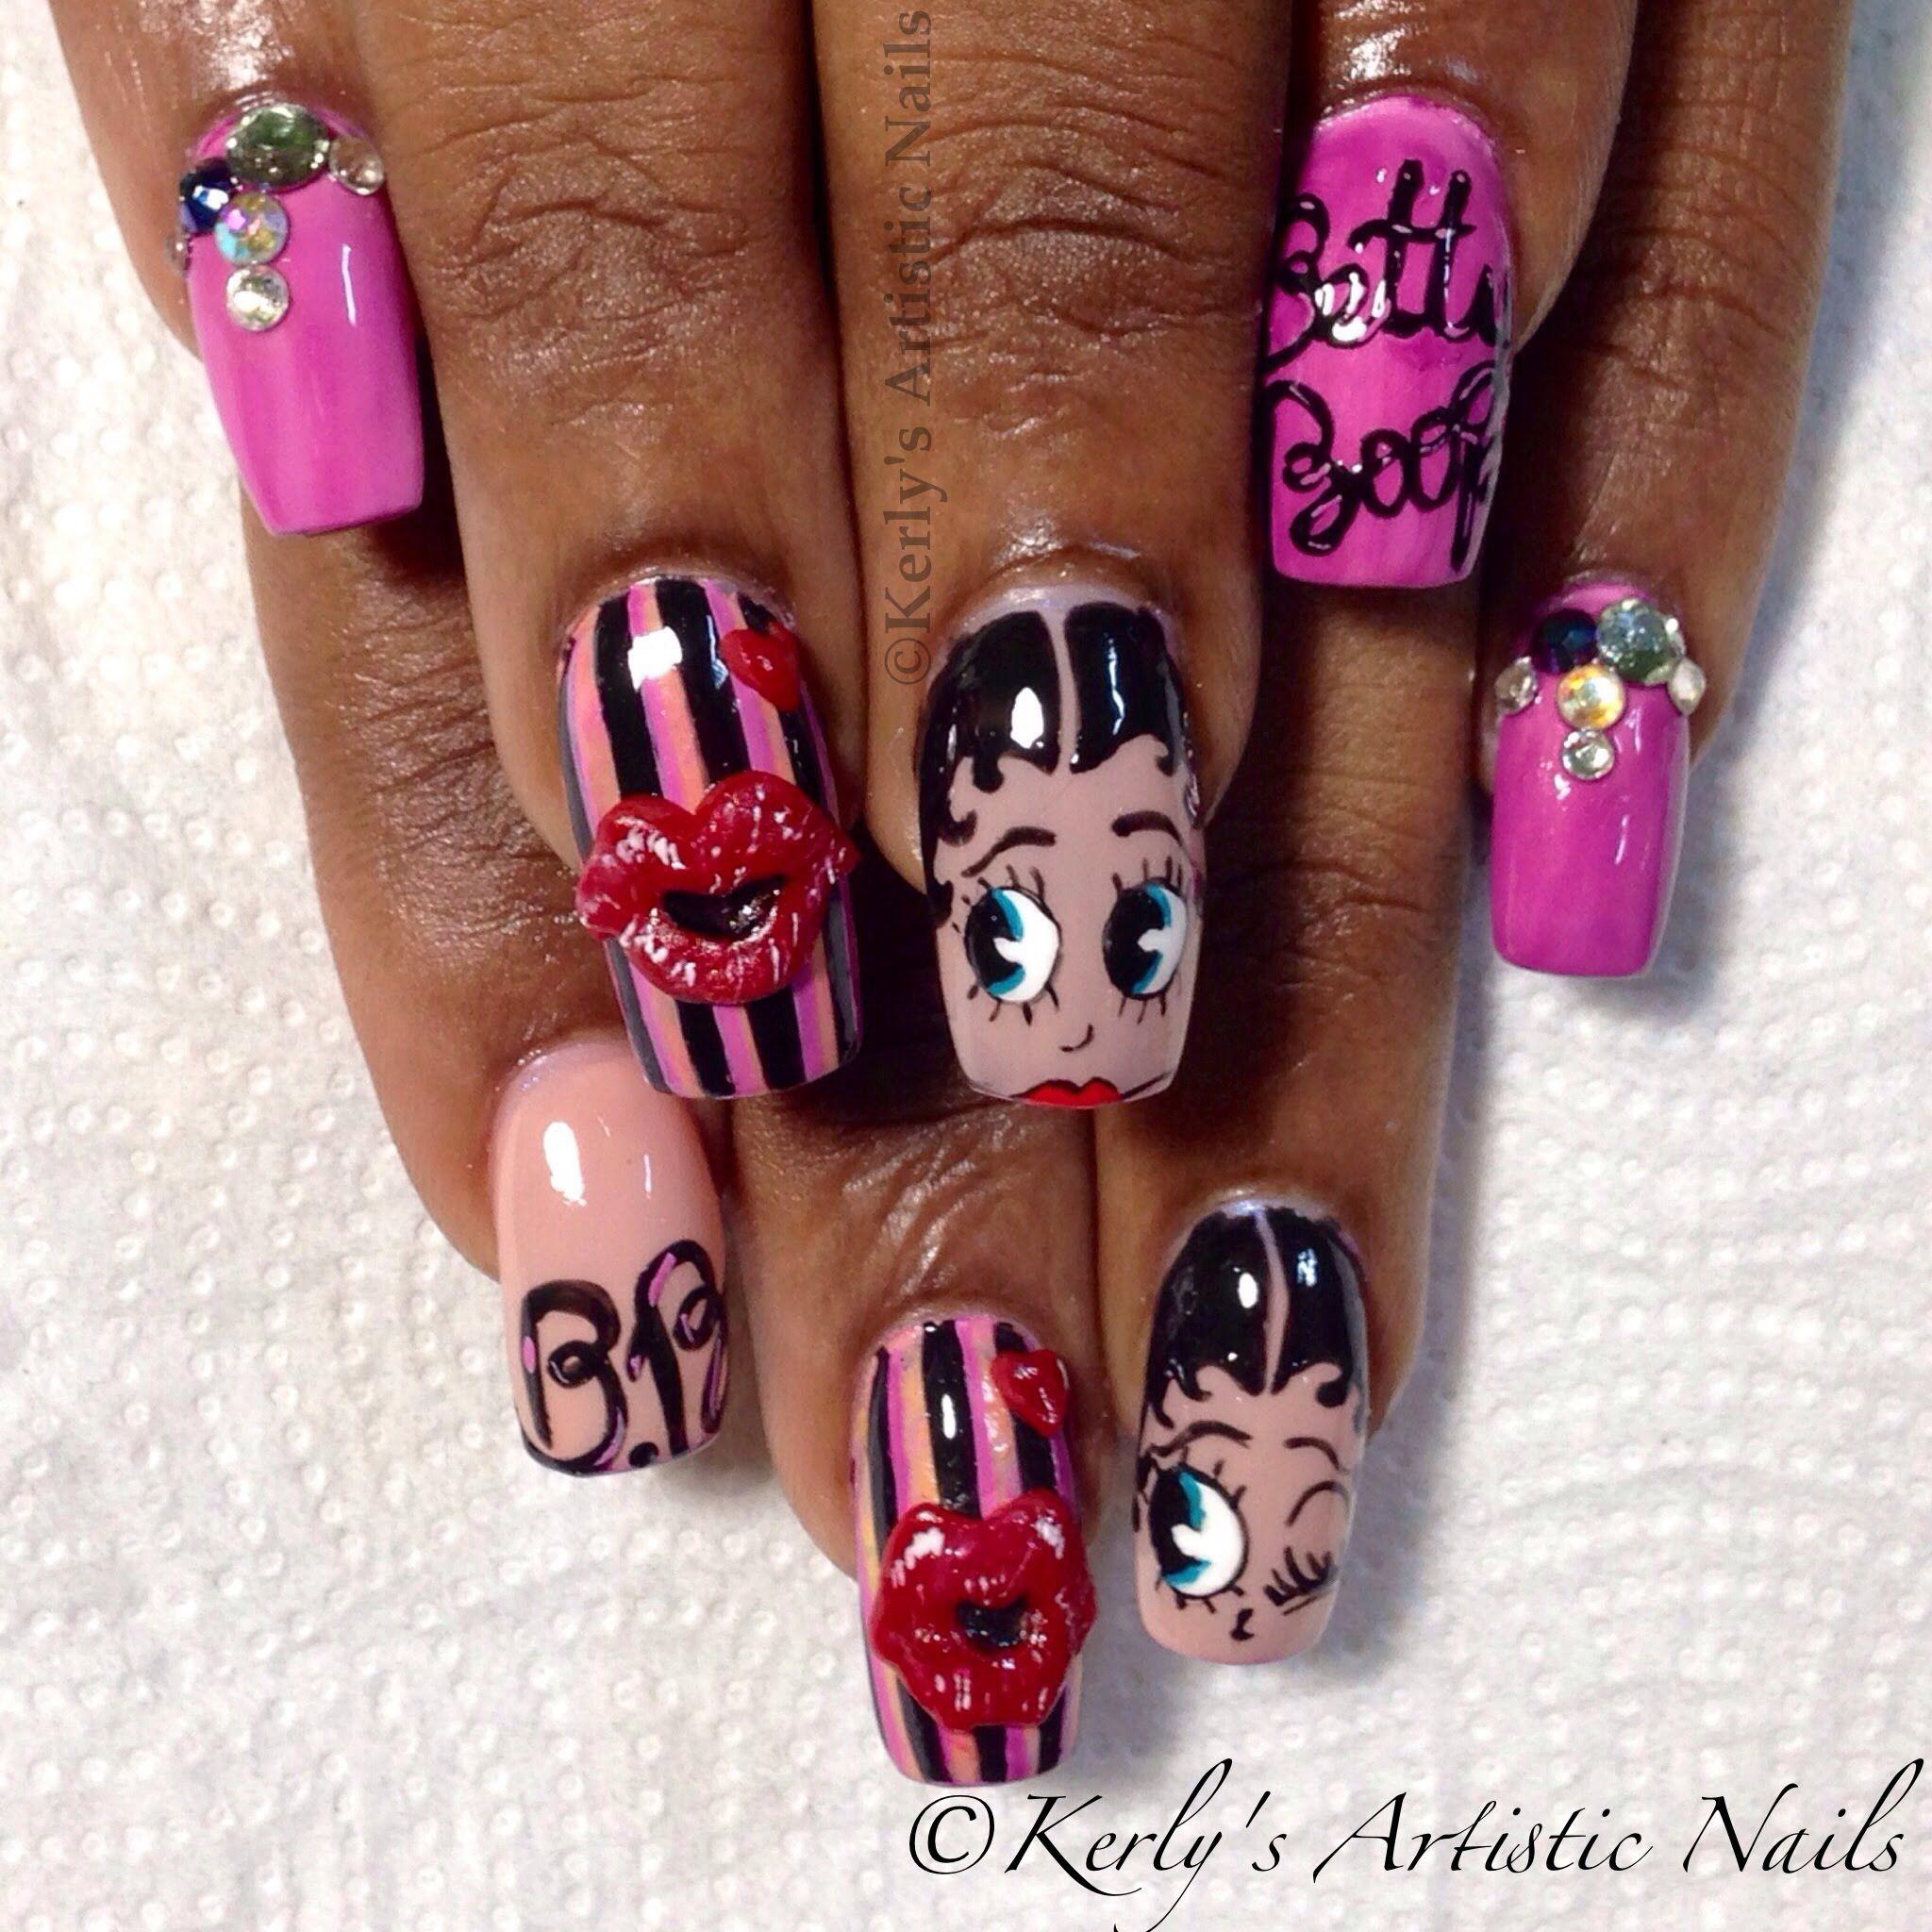 Betty Boop Nails: Betty Boop Song And Nail Art Display - YouTube